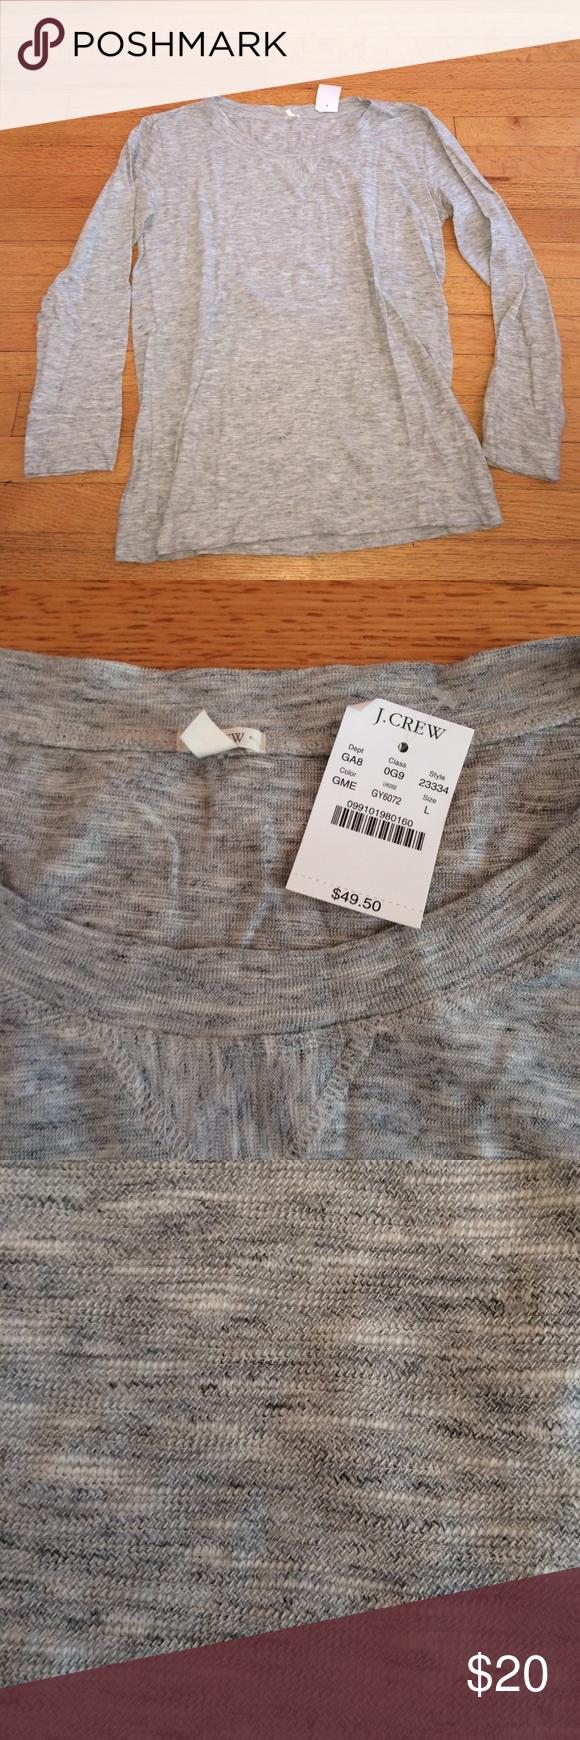 NWT J.Crew Light Grey Shirt NWT J.Crew Light Grey Shirt . Brand new, size large. 90% cotton, 10% wool. J. Crew Tops Tees - Long Sleeve